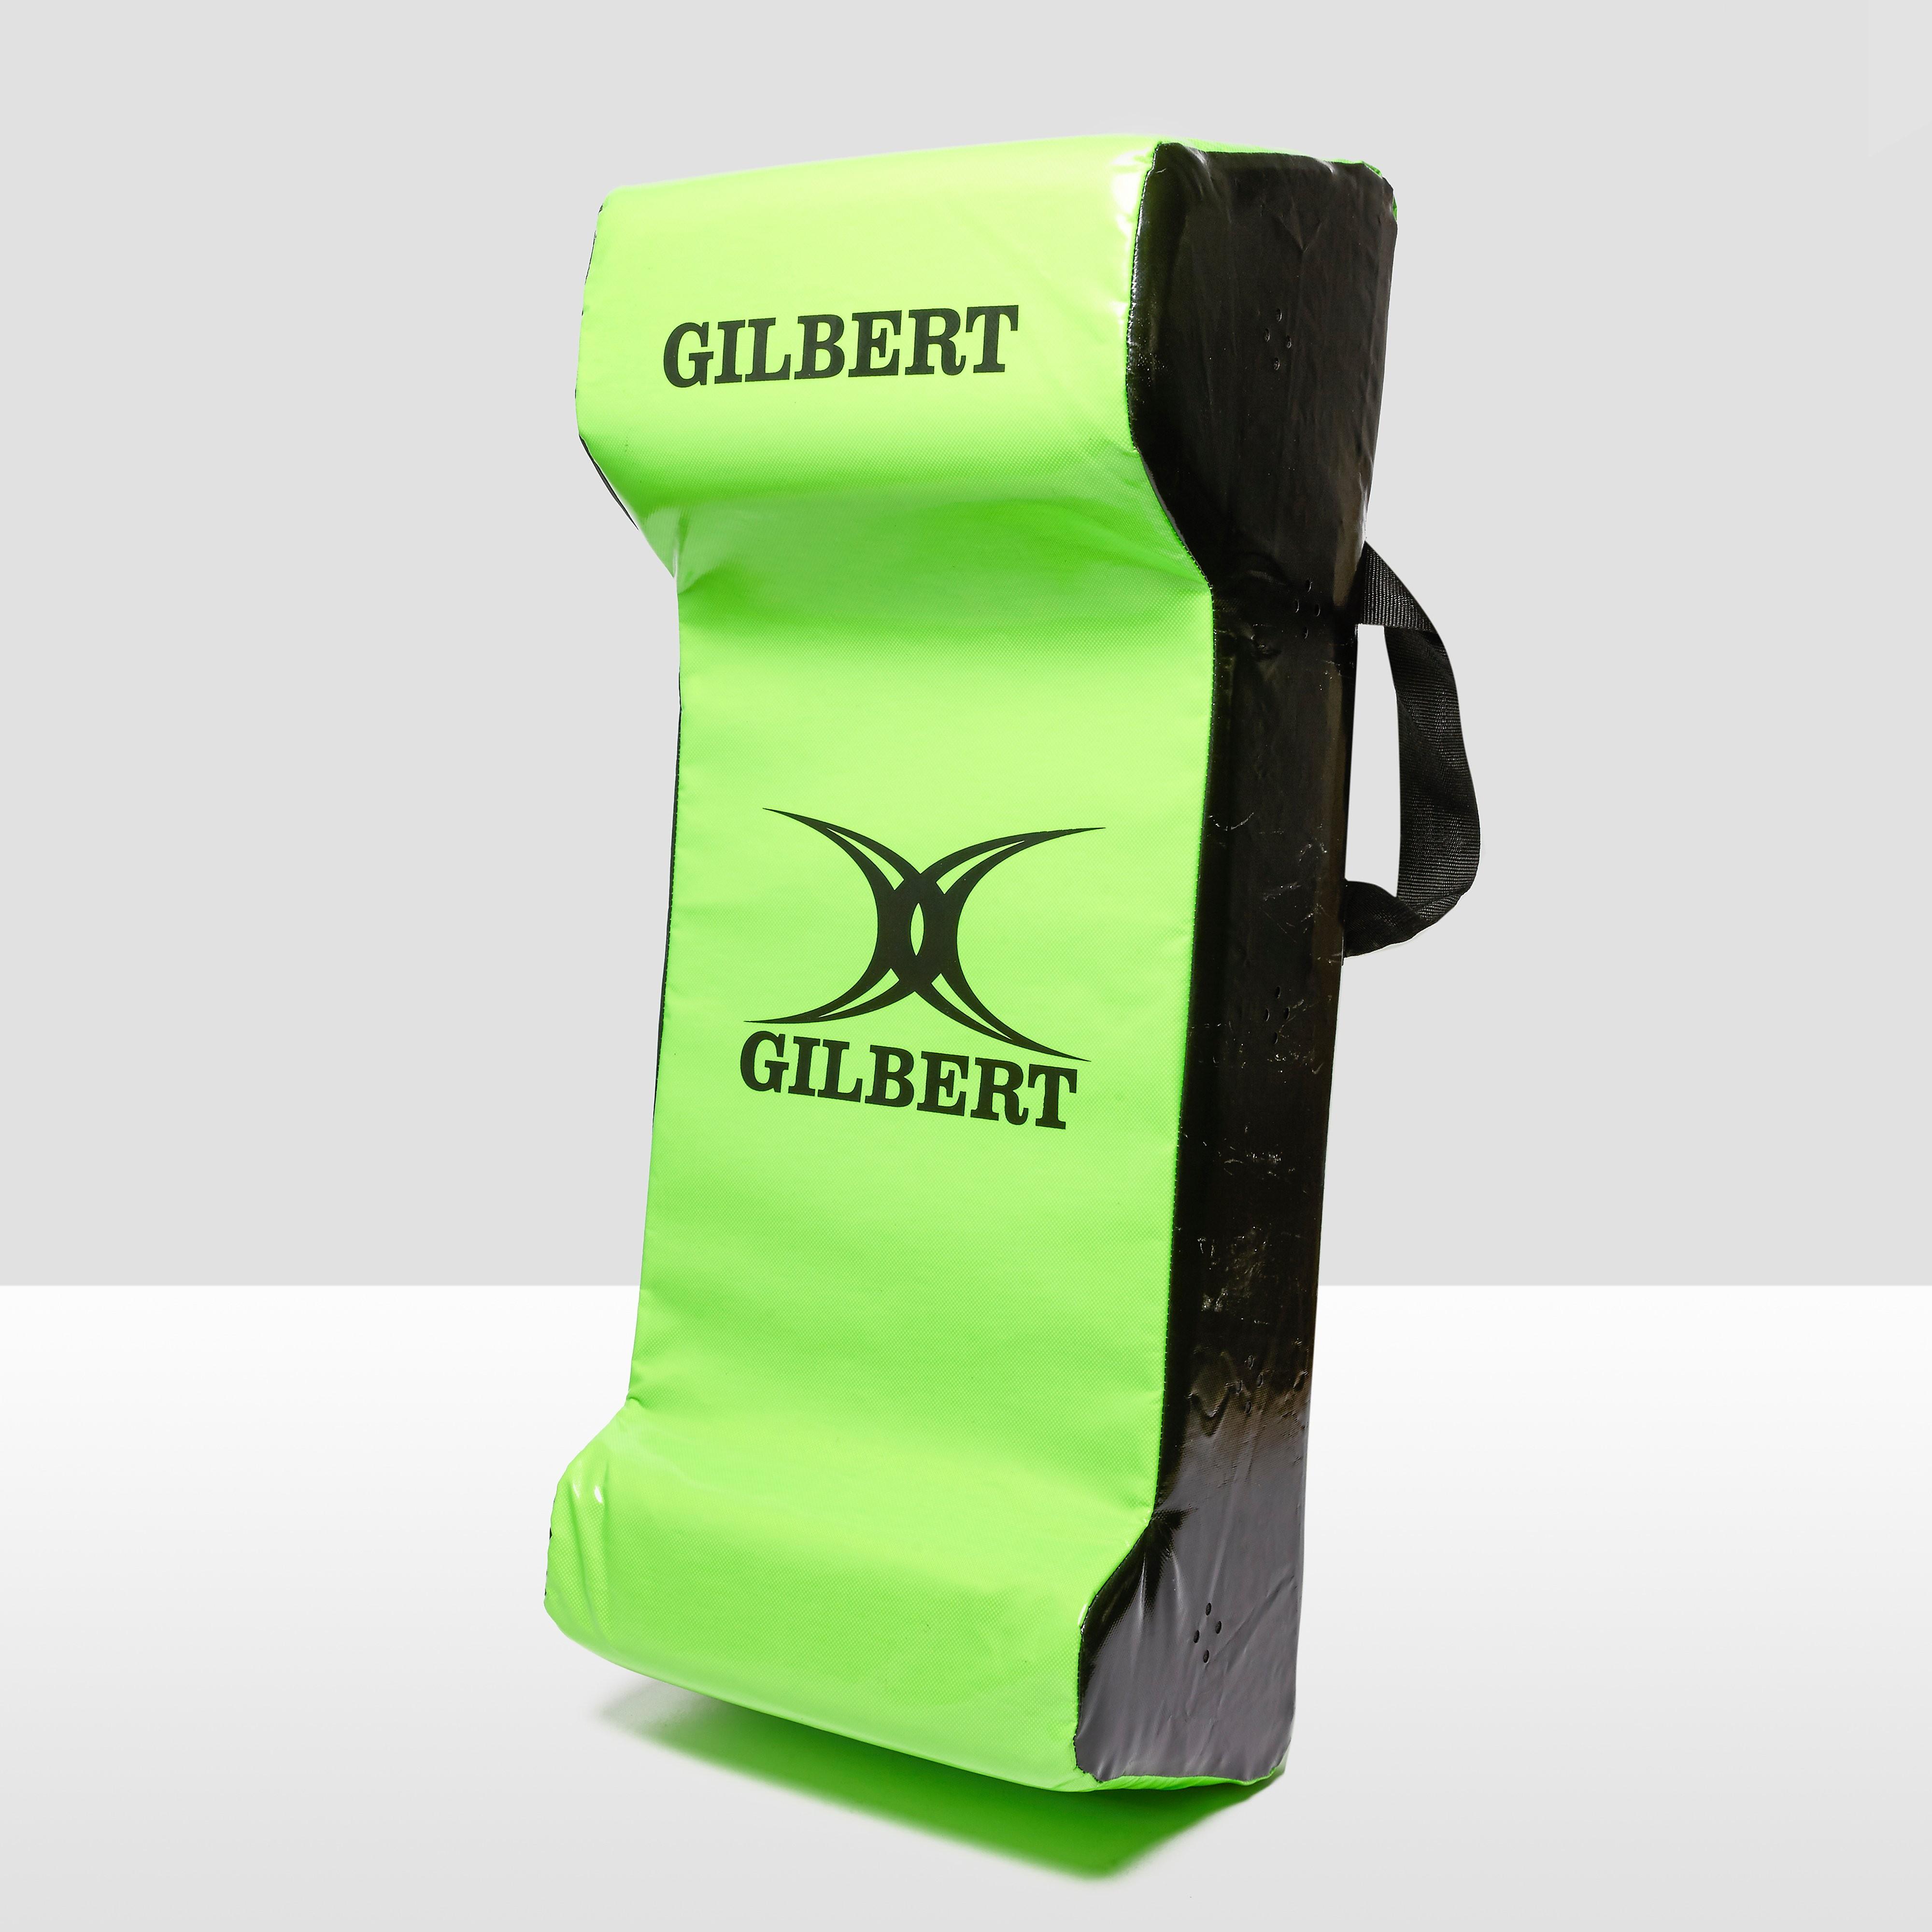 Gilbert Senior Tackle Wedge